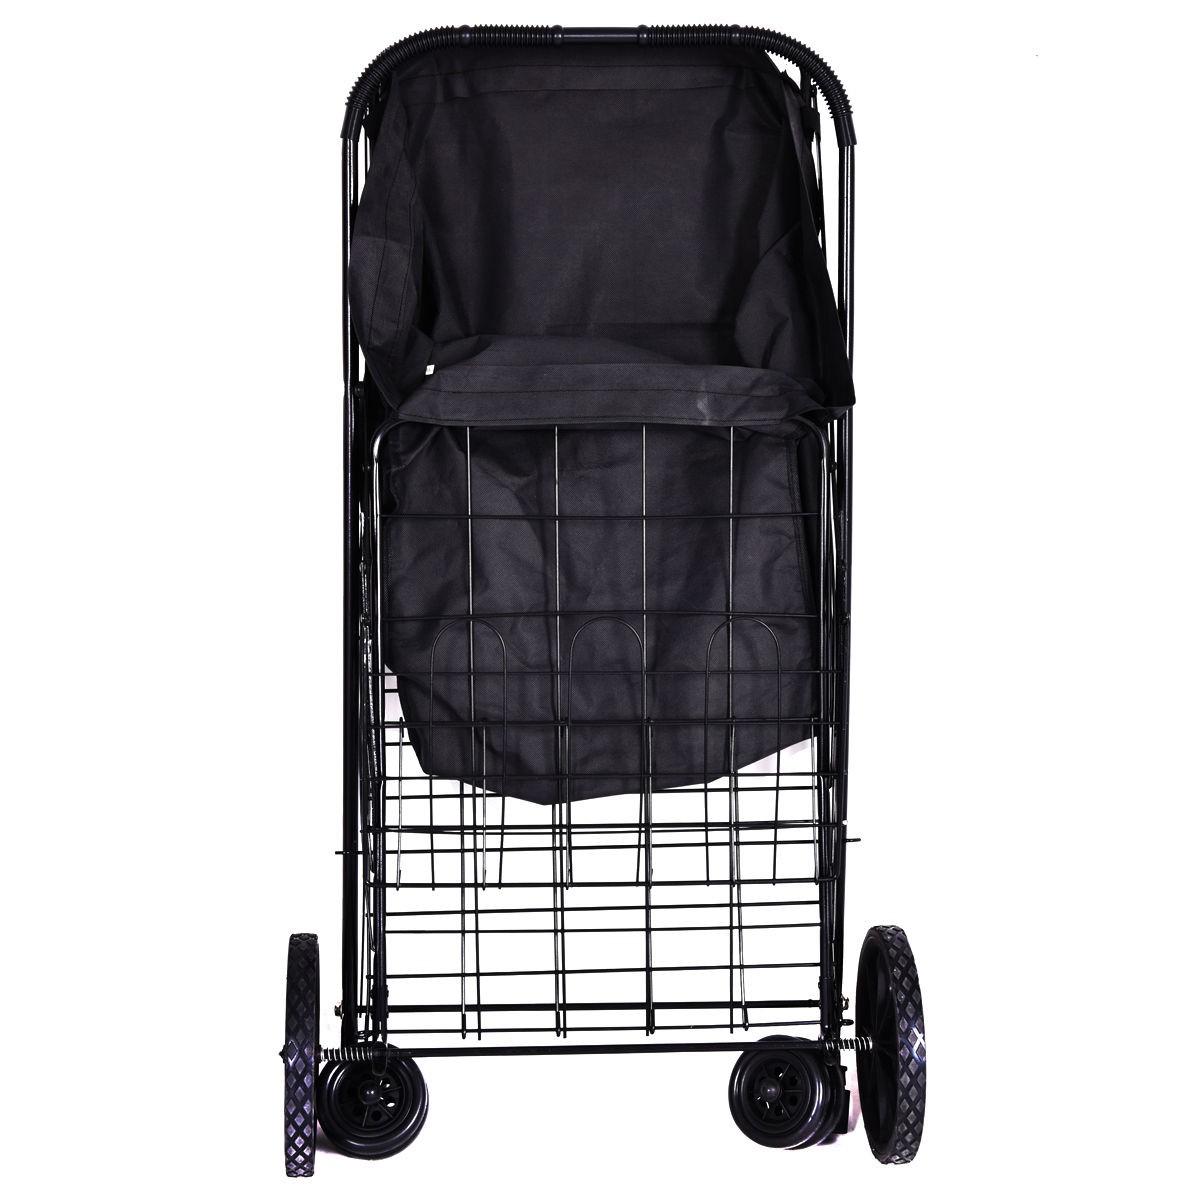 Jumbo size basket folding shopping cart with wheels for laundry grocery travel ebay - Collapsible laundry basket with wheels ...